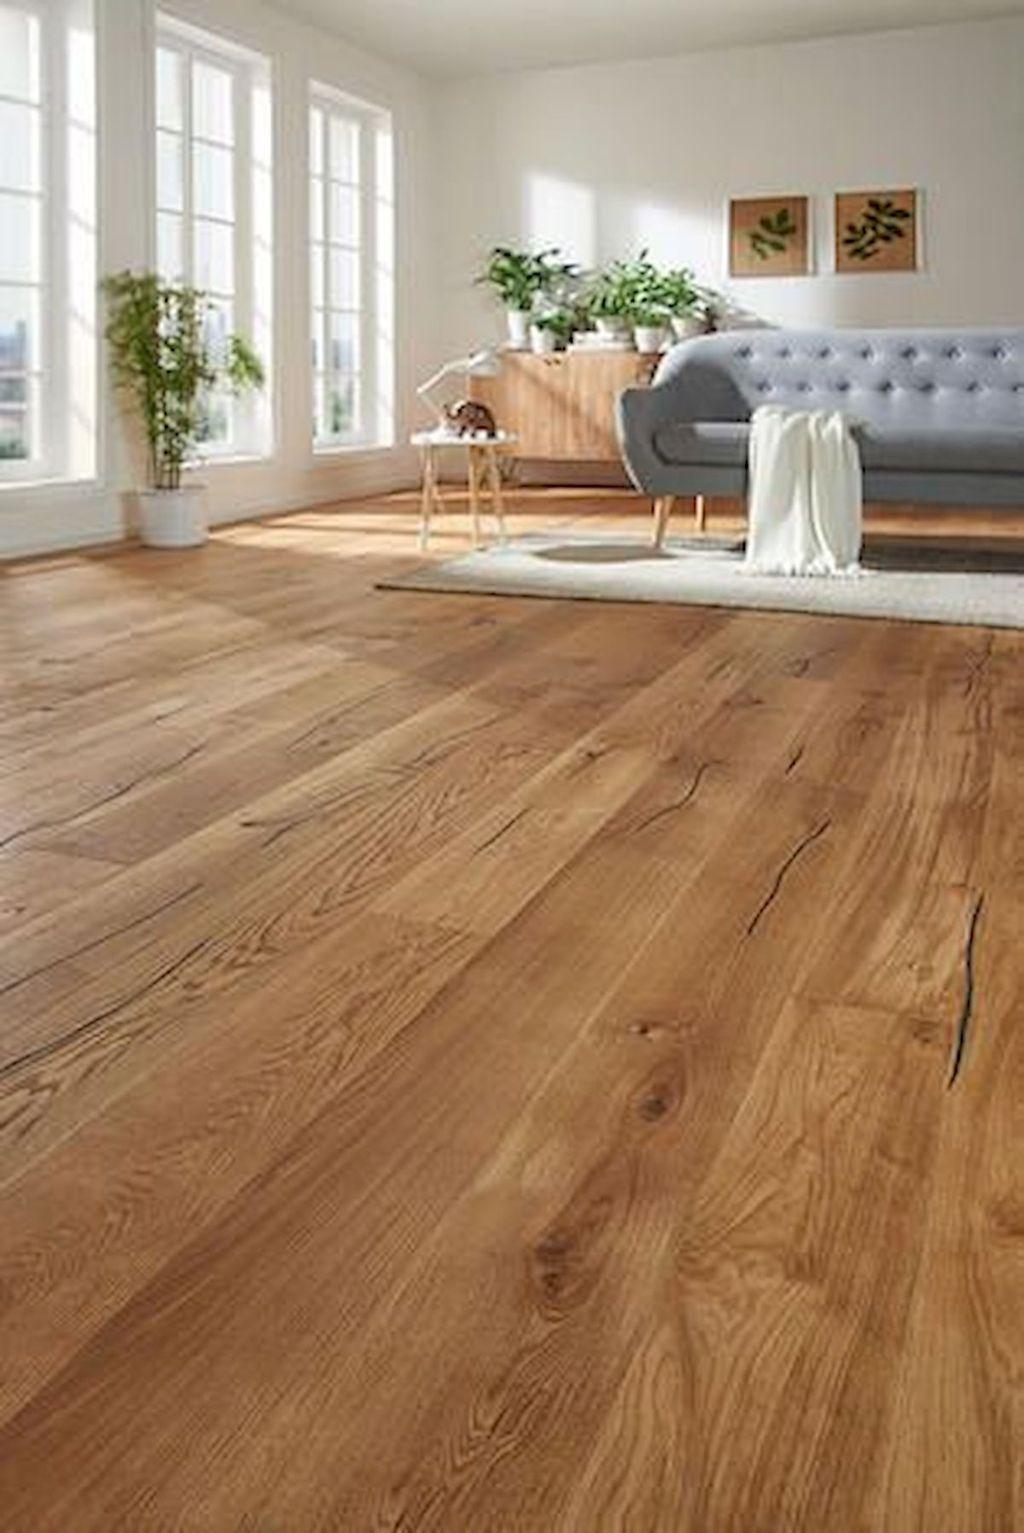 20 Best Ideas To Update Your Floor Design Farmhouse Flooring Wood Floor Colors House Flooring